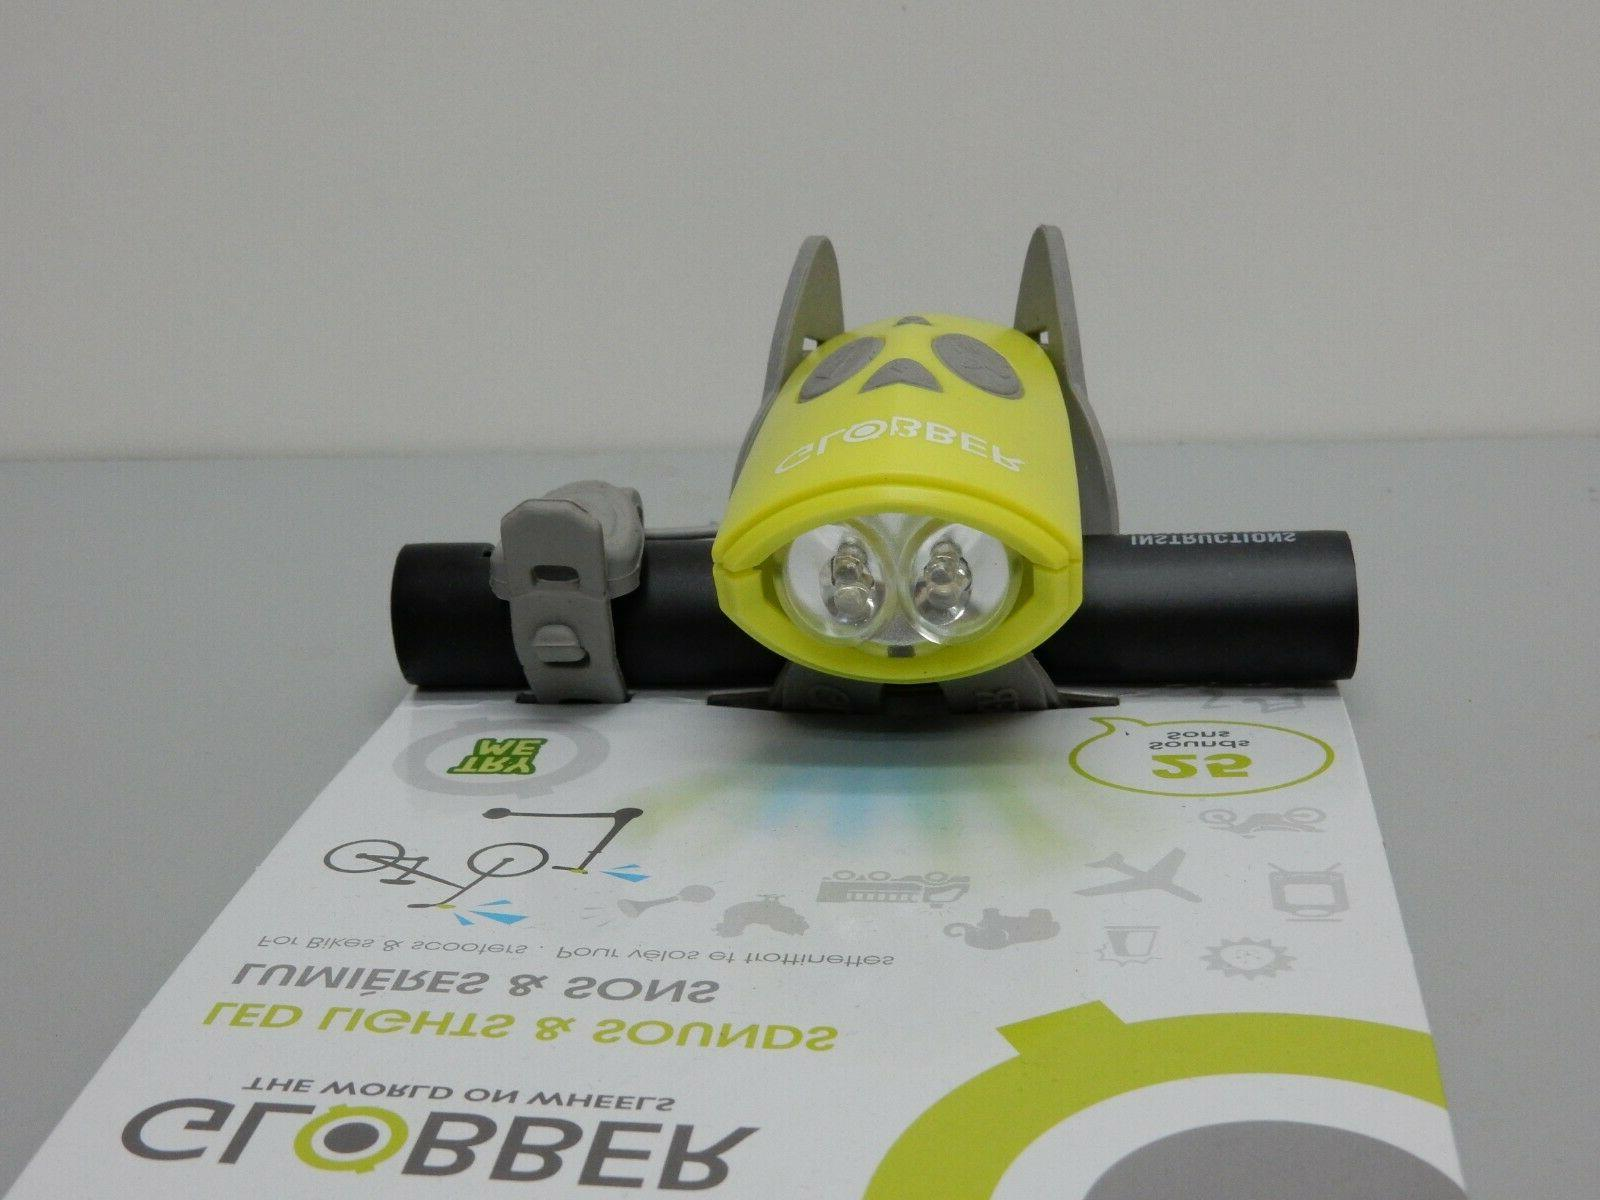 Globber Hornet Scooter & Accessory -